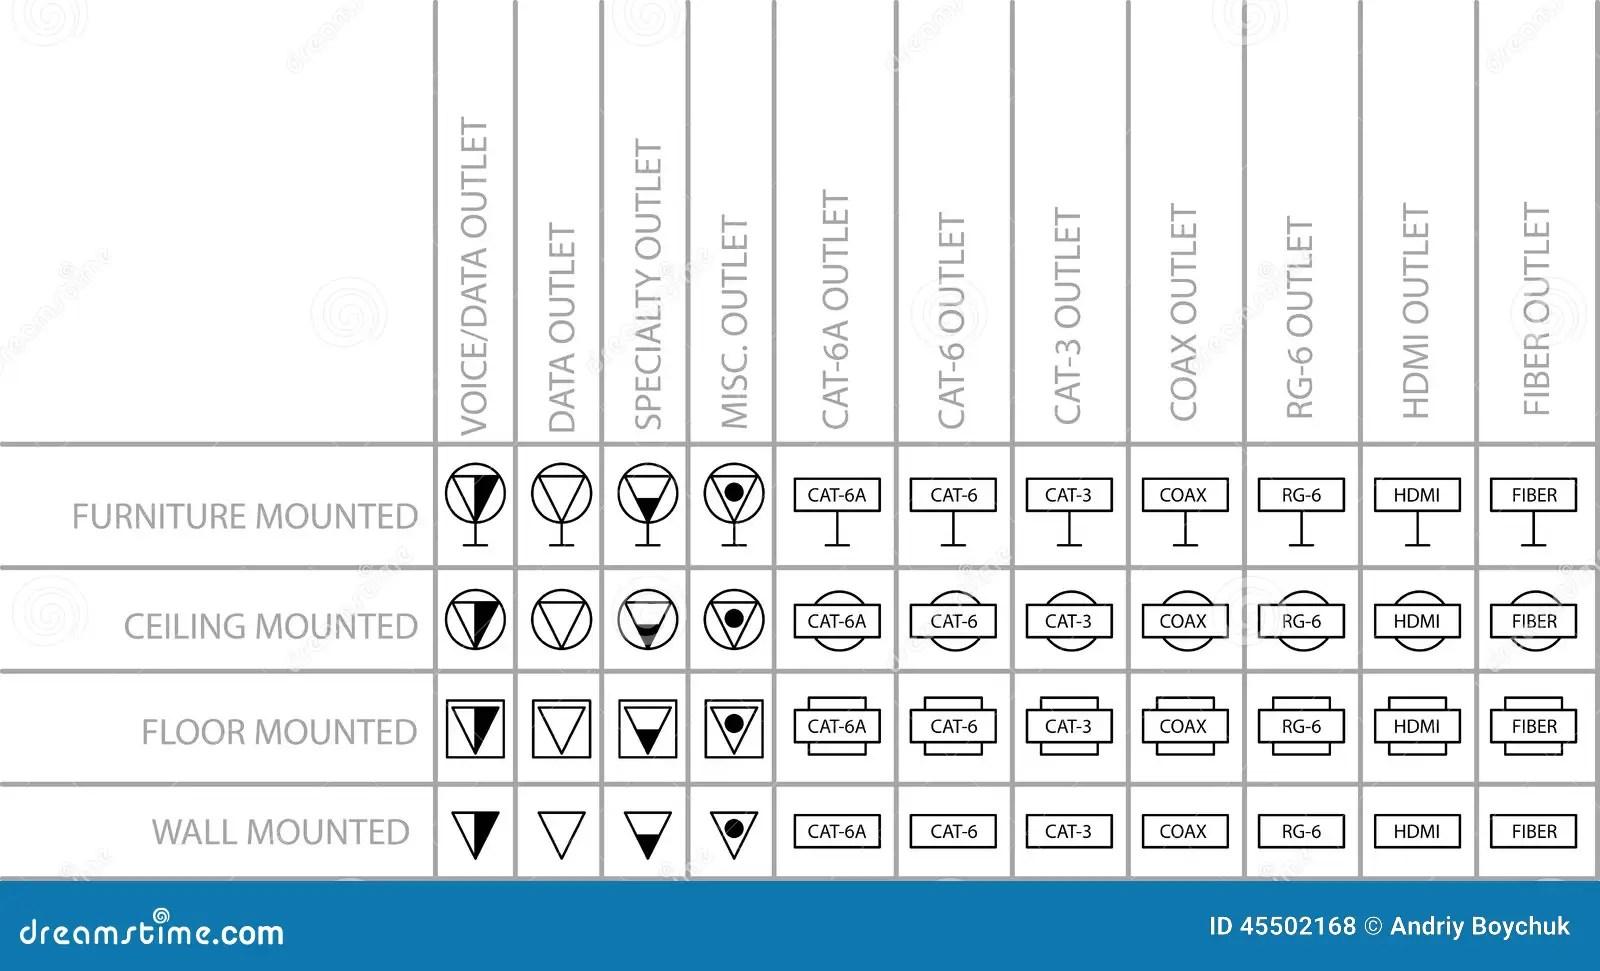 For The Cat5 Cable Rj45 Jack Wiring Diagram Free Download Telecommunicatie En Audiovisuele Afzetsymbolen Vector